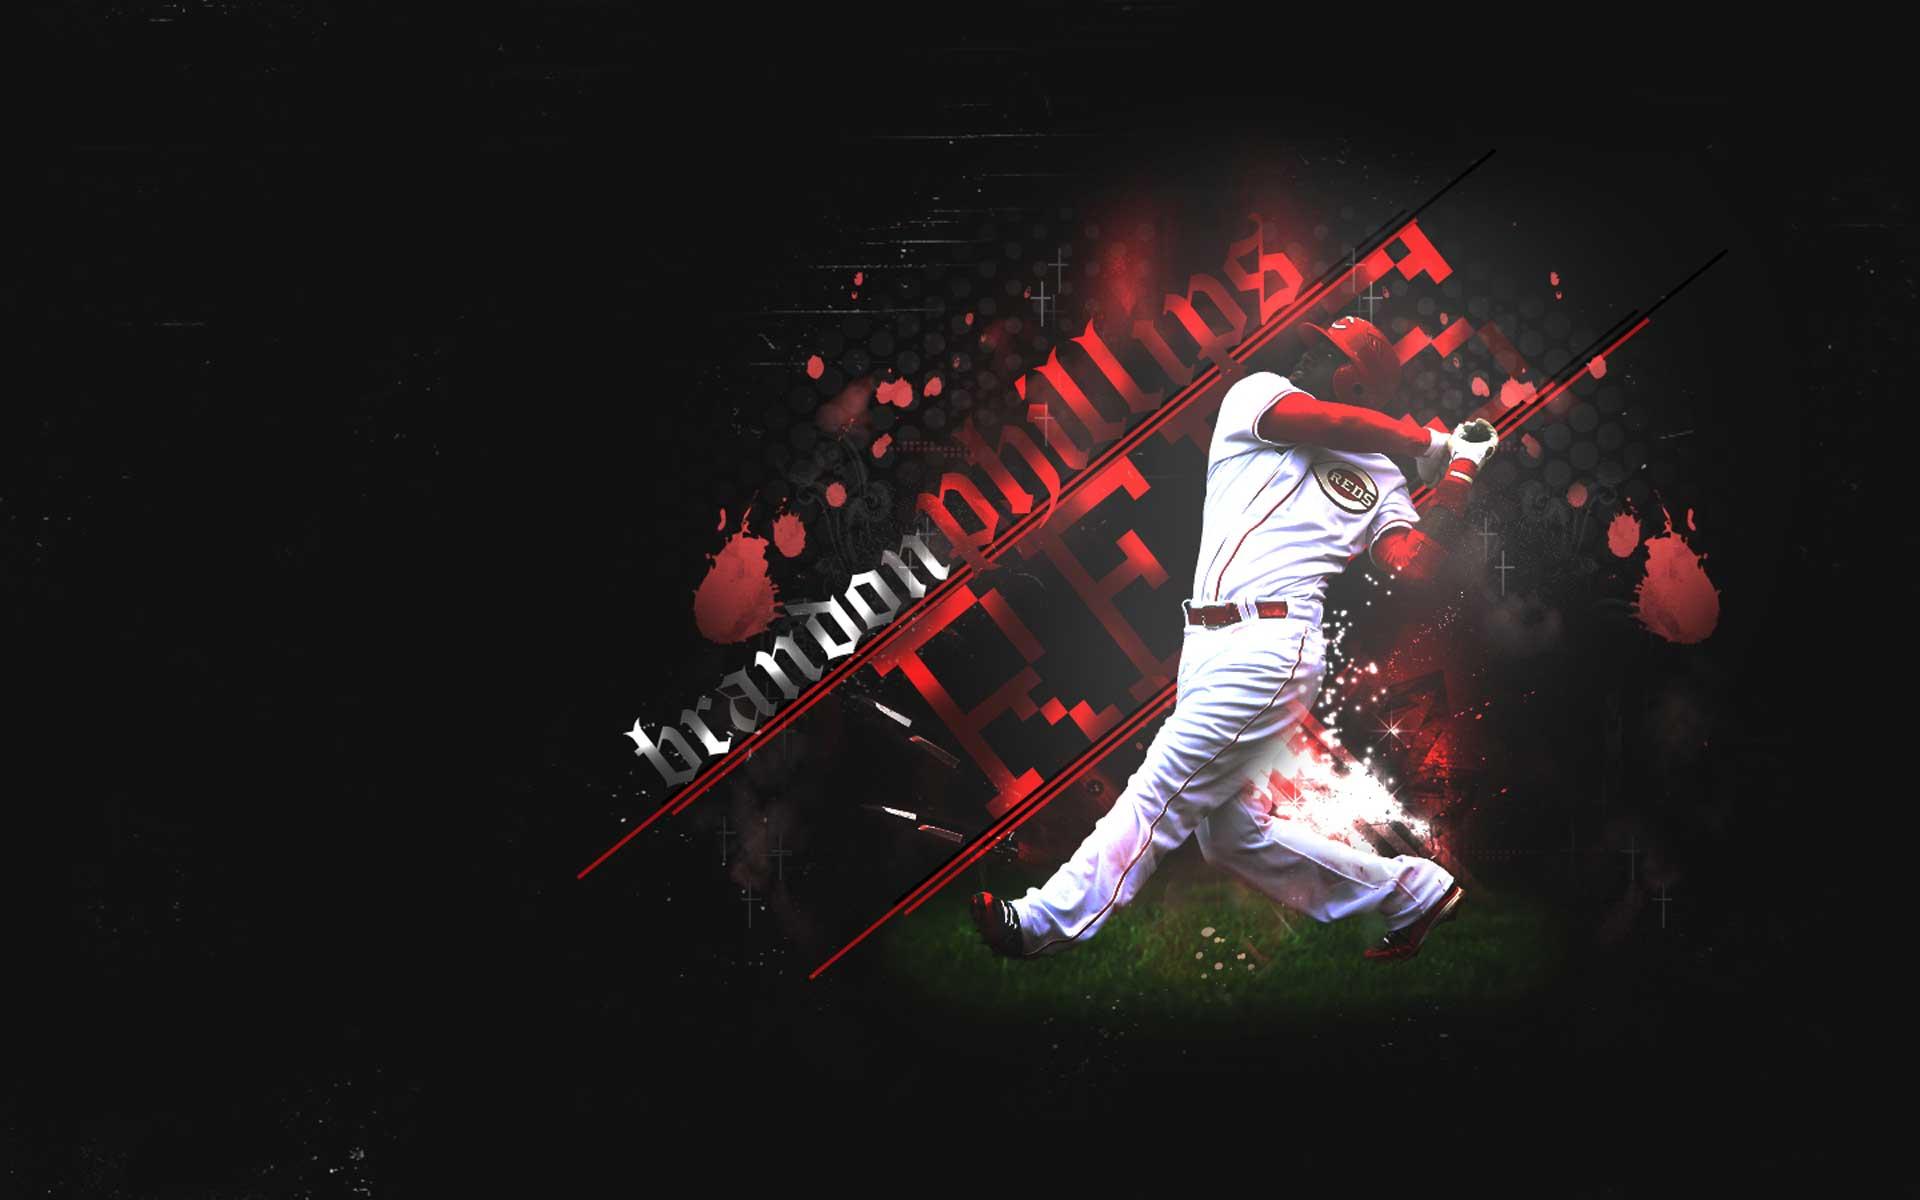 CINCINNATI REDS mlb baseball 43 wallpaper 1920x1200 229538 1920x1200